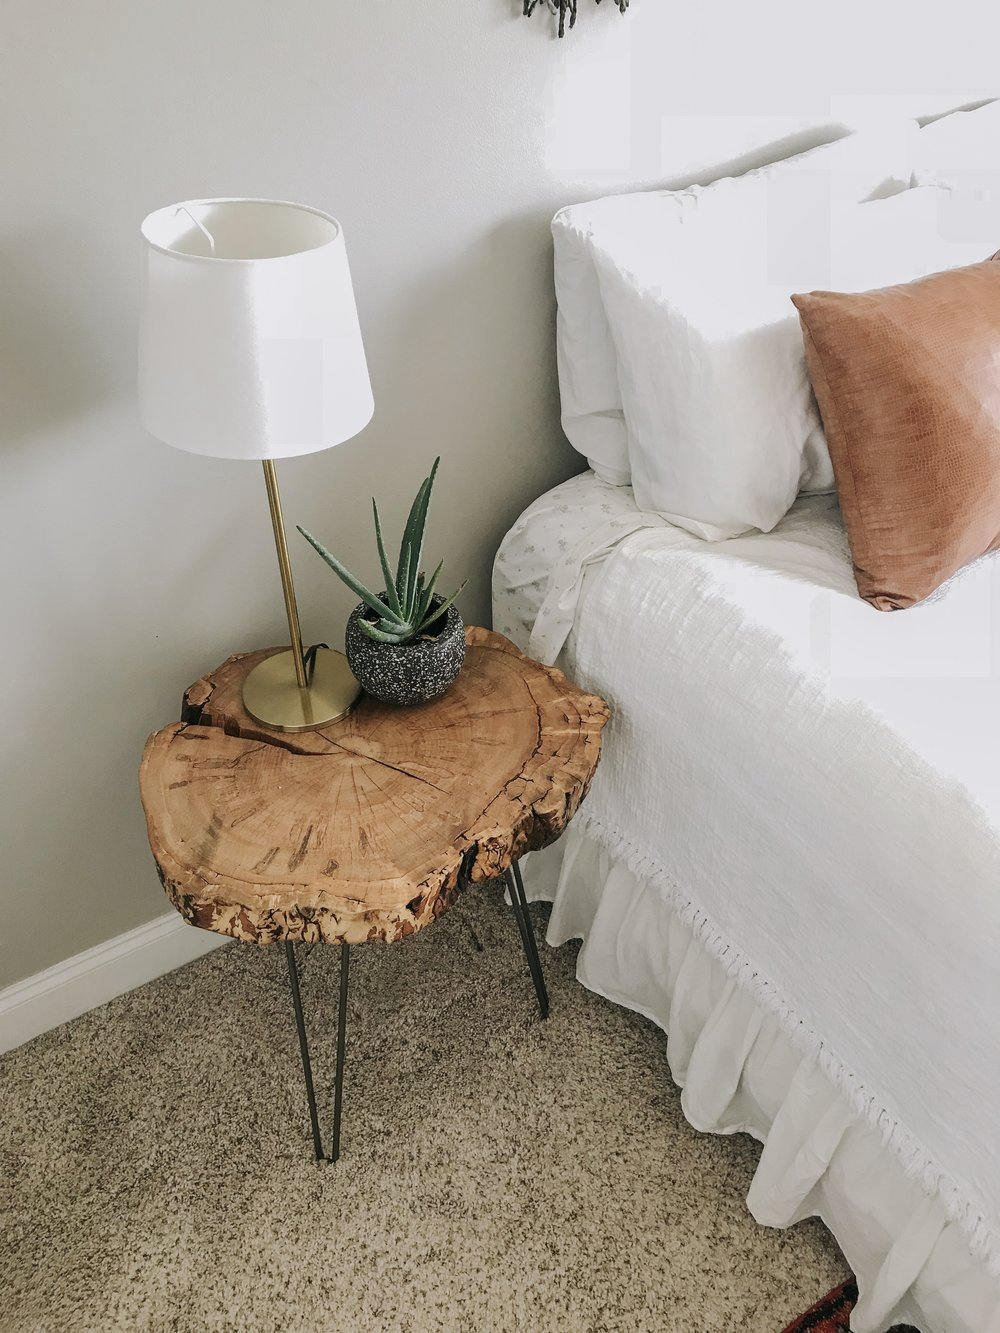 Stump Tables - Starting at $295.00